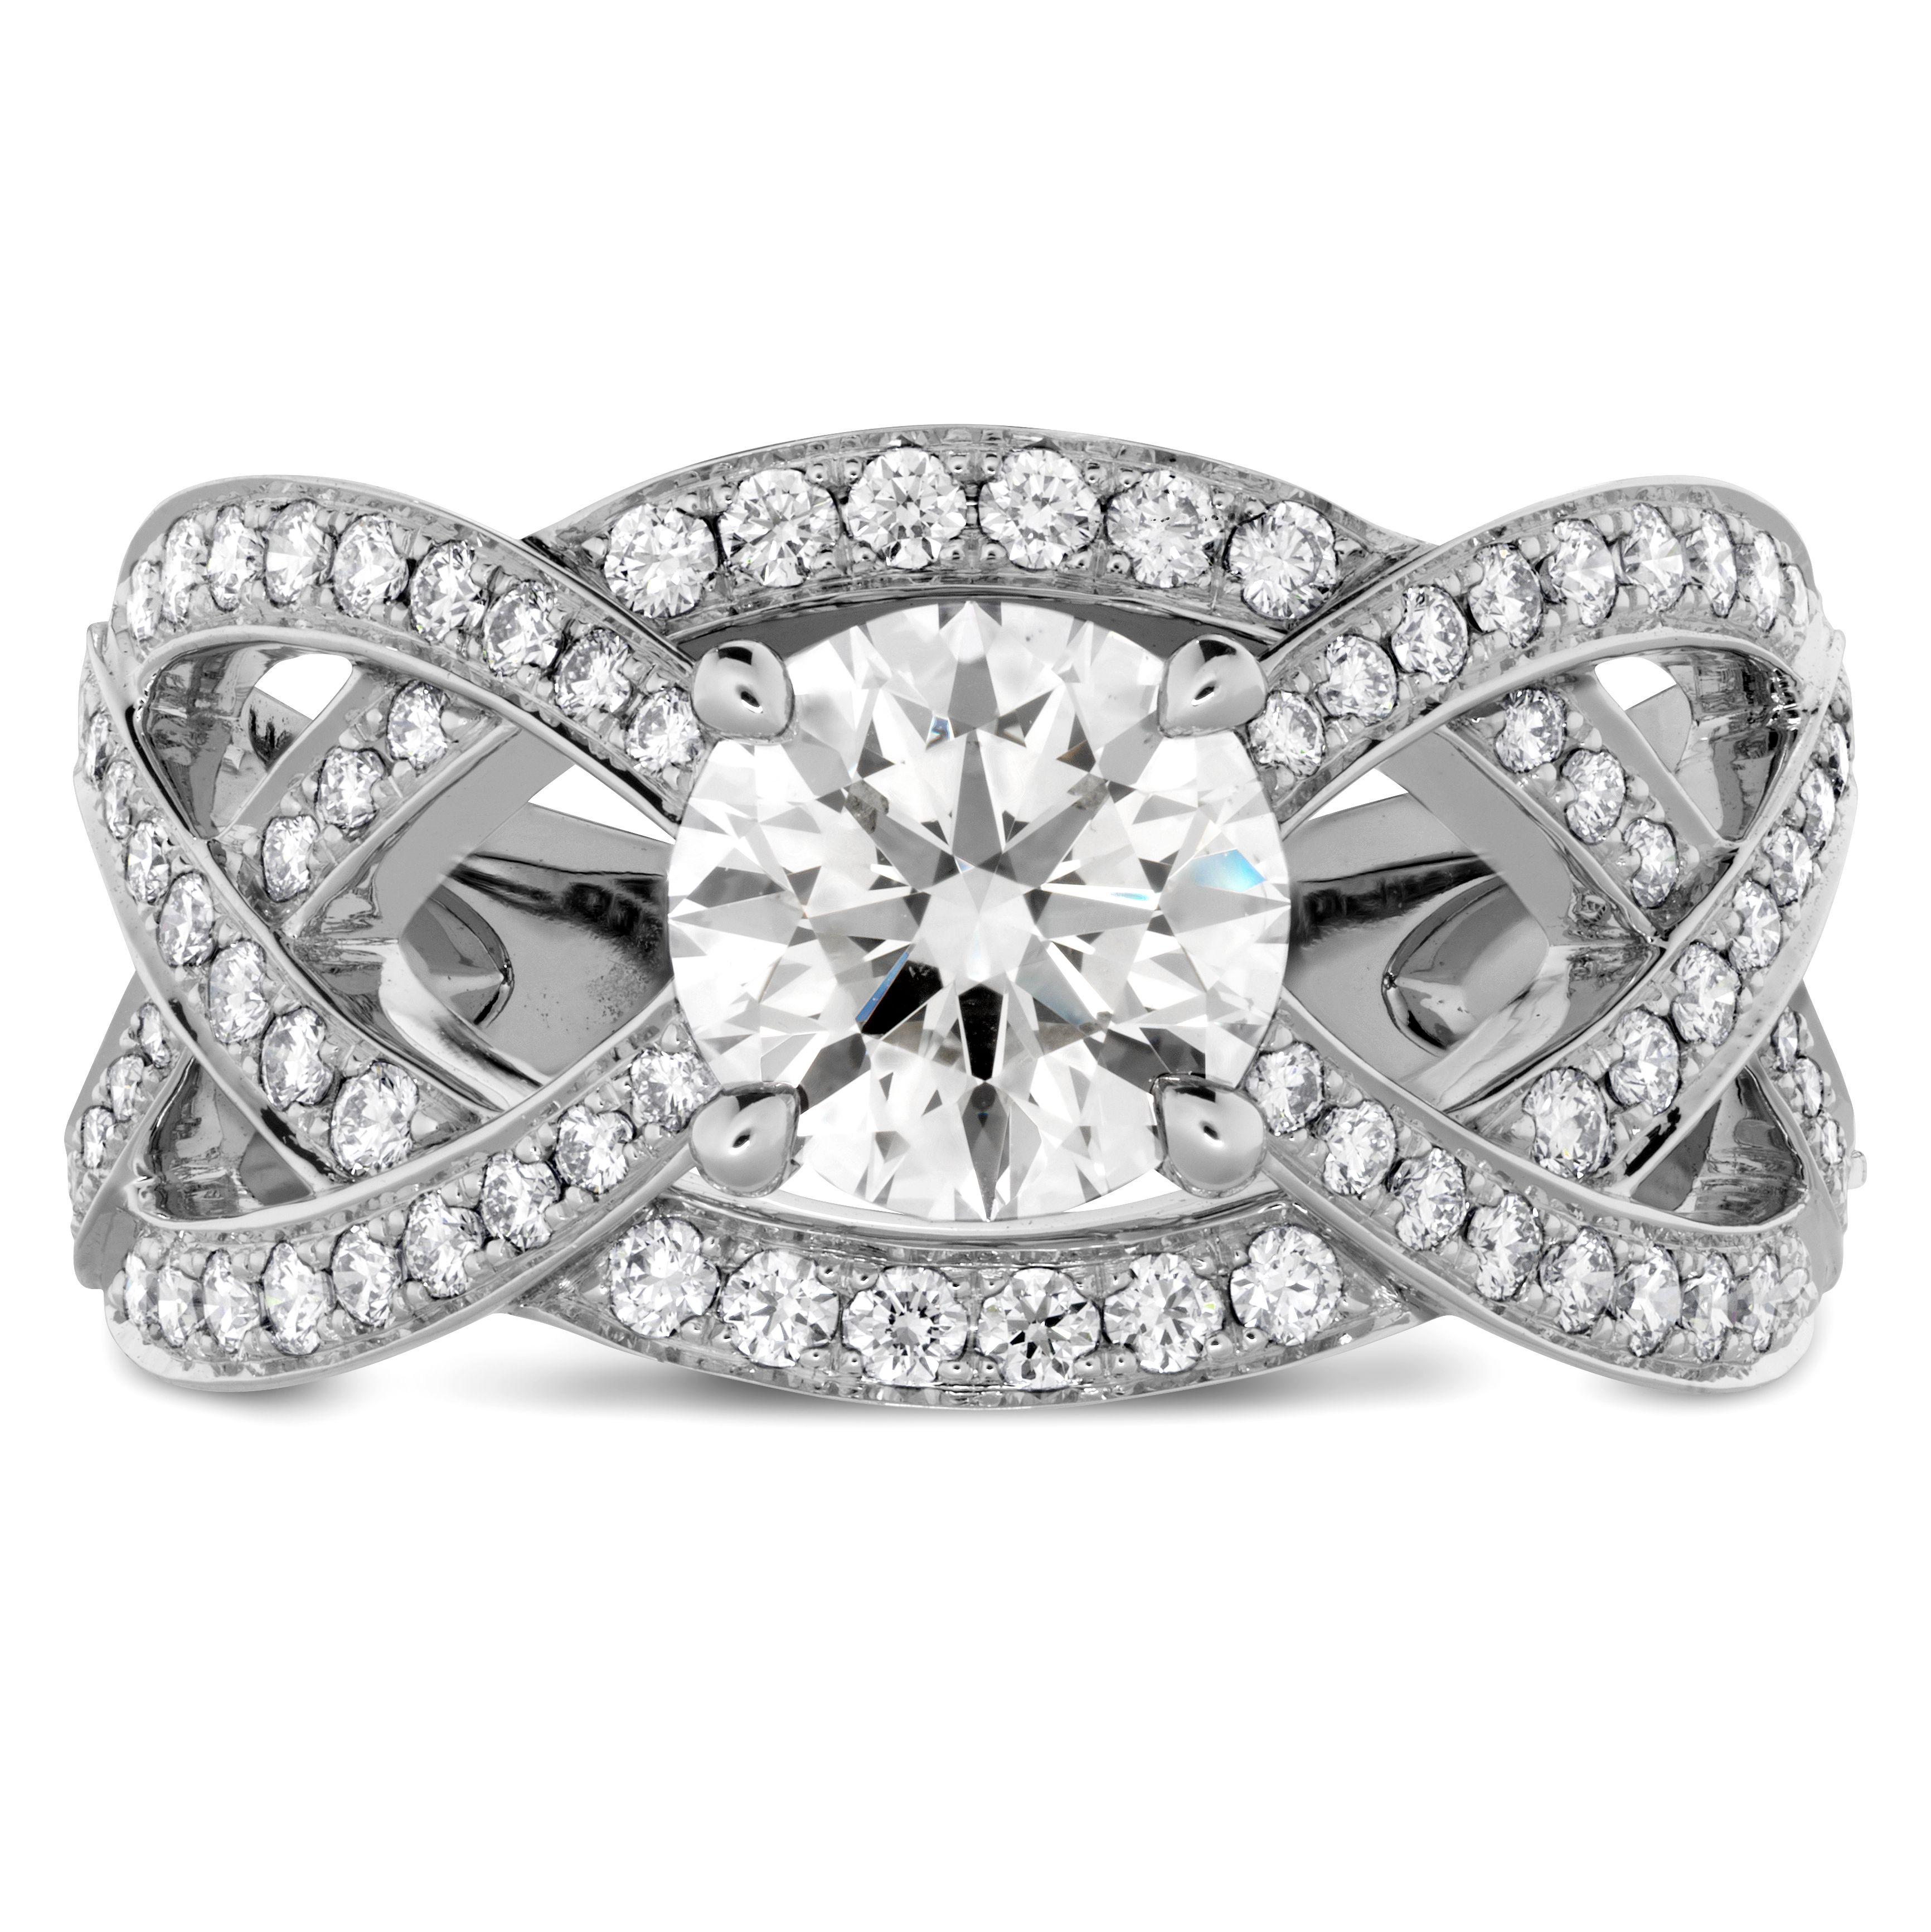 68aa4df7ea4fb Intertwining HOF Diamond Engagement Ring #HOF #Diamonds   For The ...